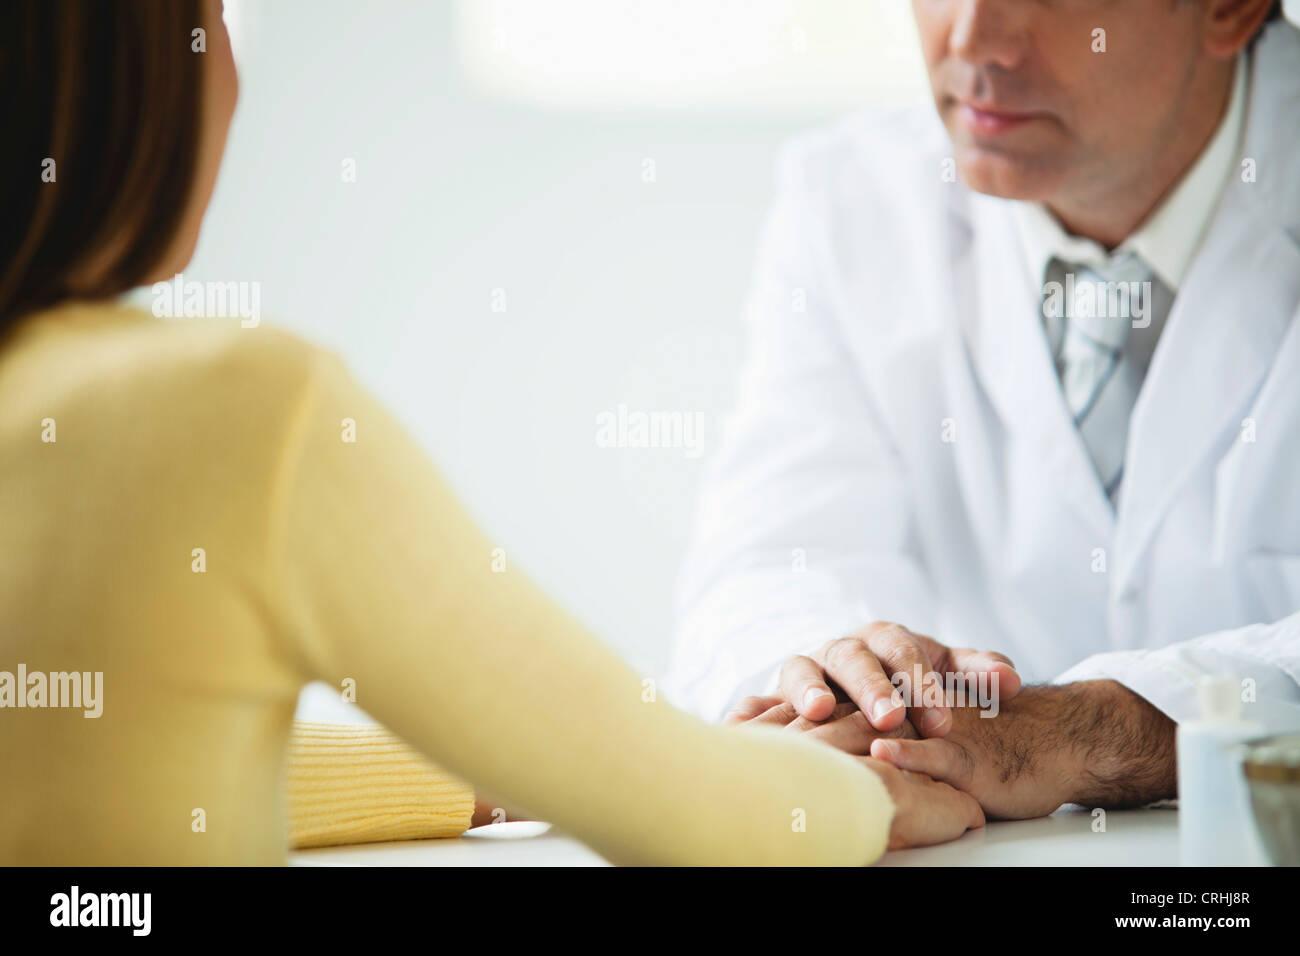 Doctor comforting patient Stock Photo